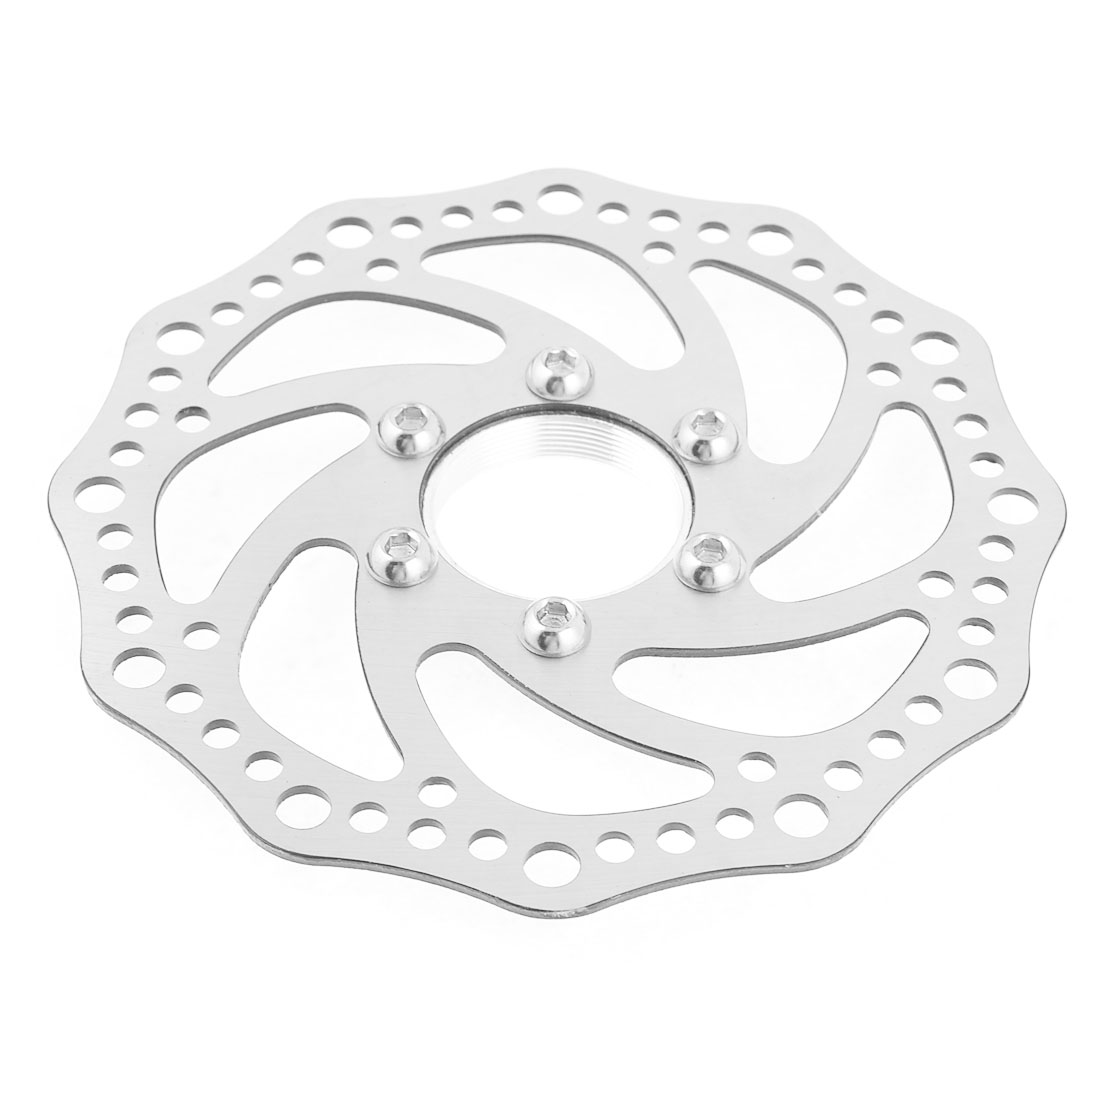 "Bike Bicycle Replacement Metal 5.5"" Diameter Front Rear Brake Disc"